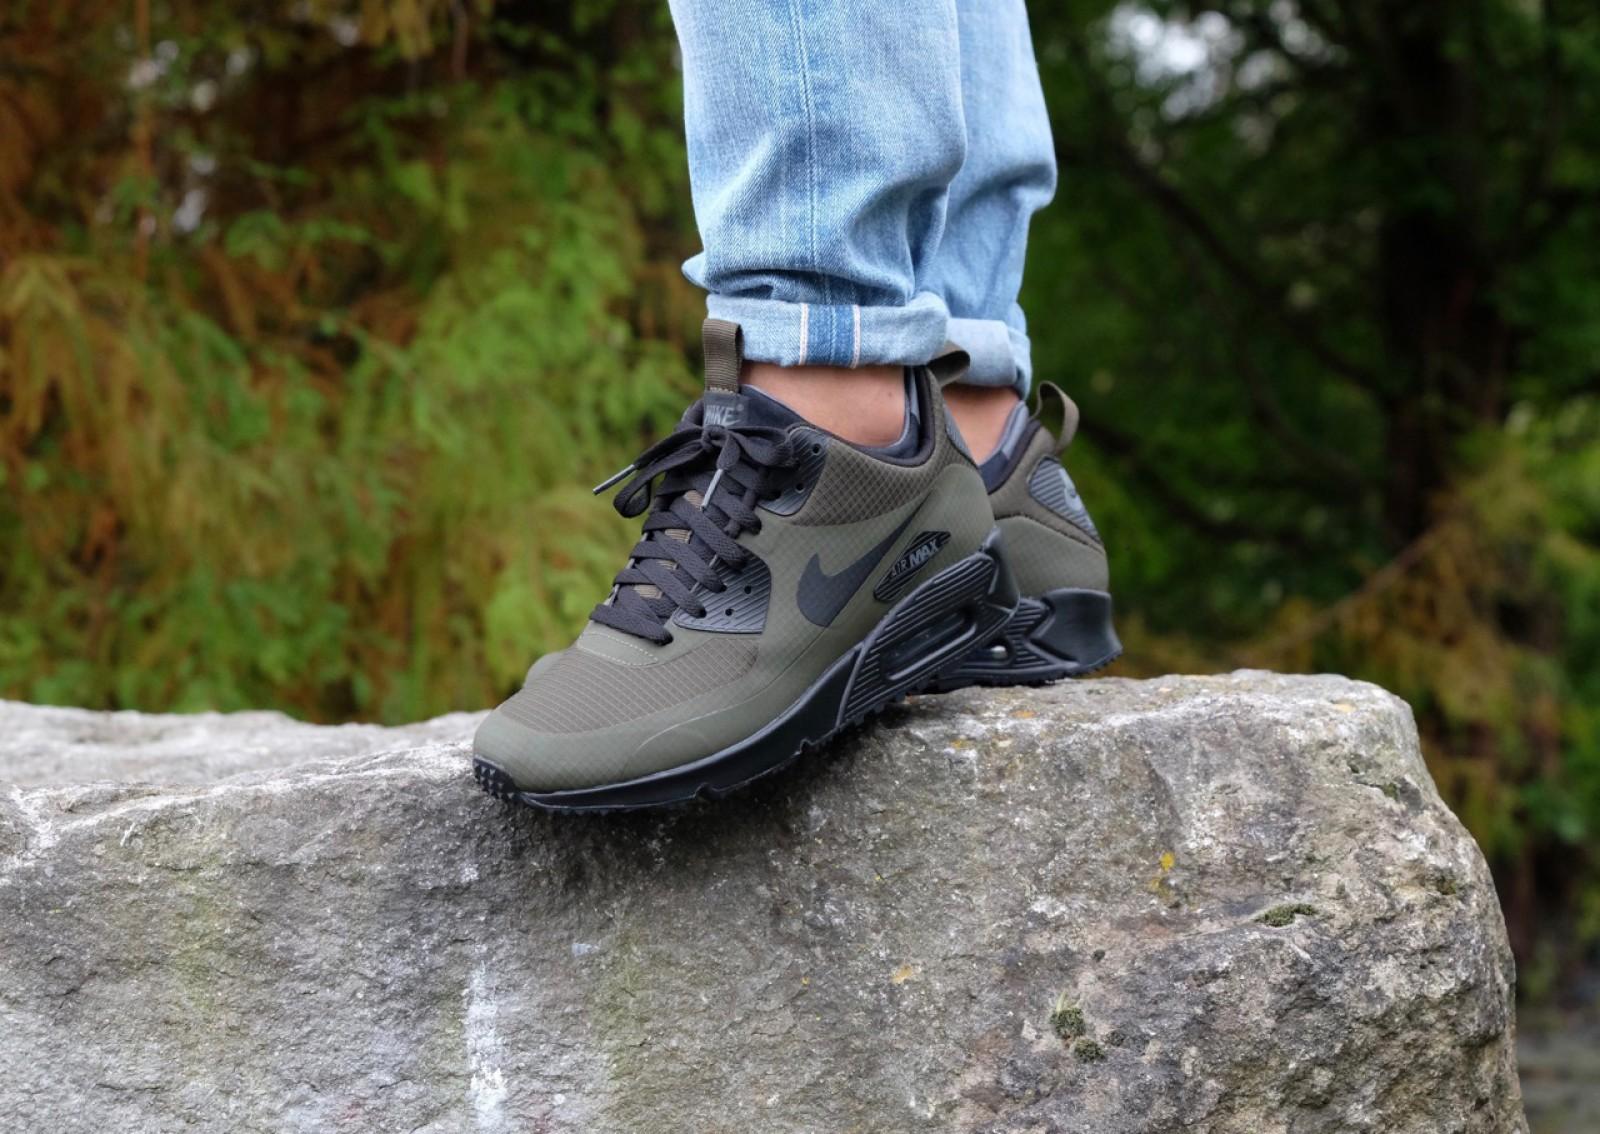 Nike Air Max 90 Mid Wntr Dark Loden Black Dark Grey 806808 300